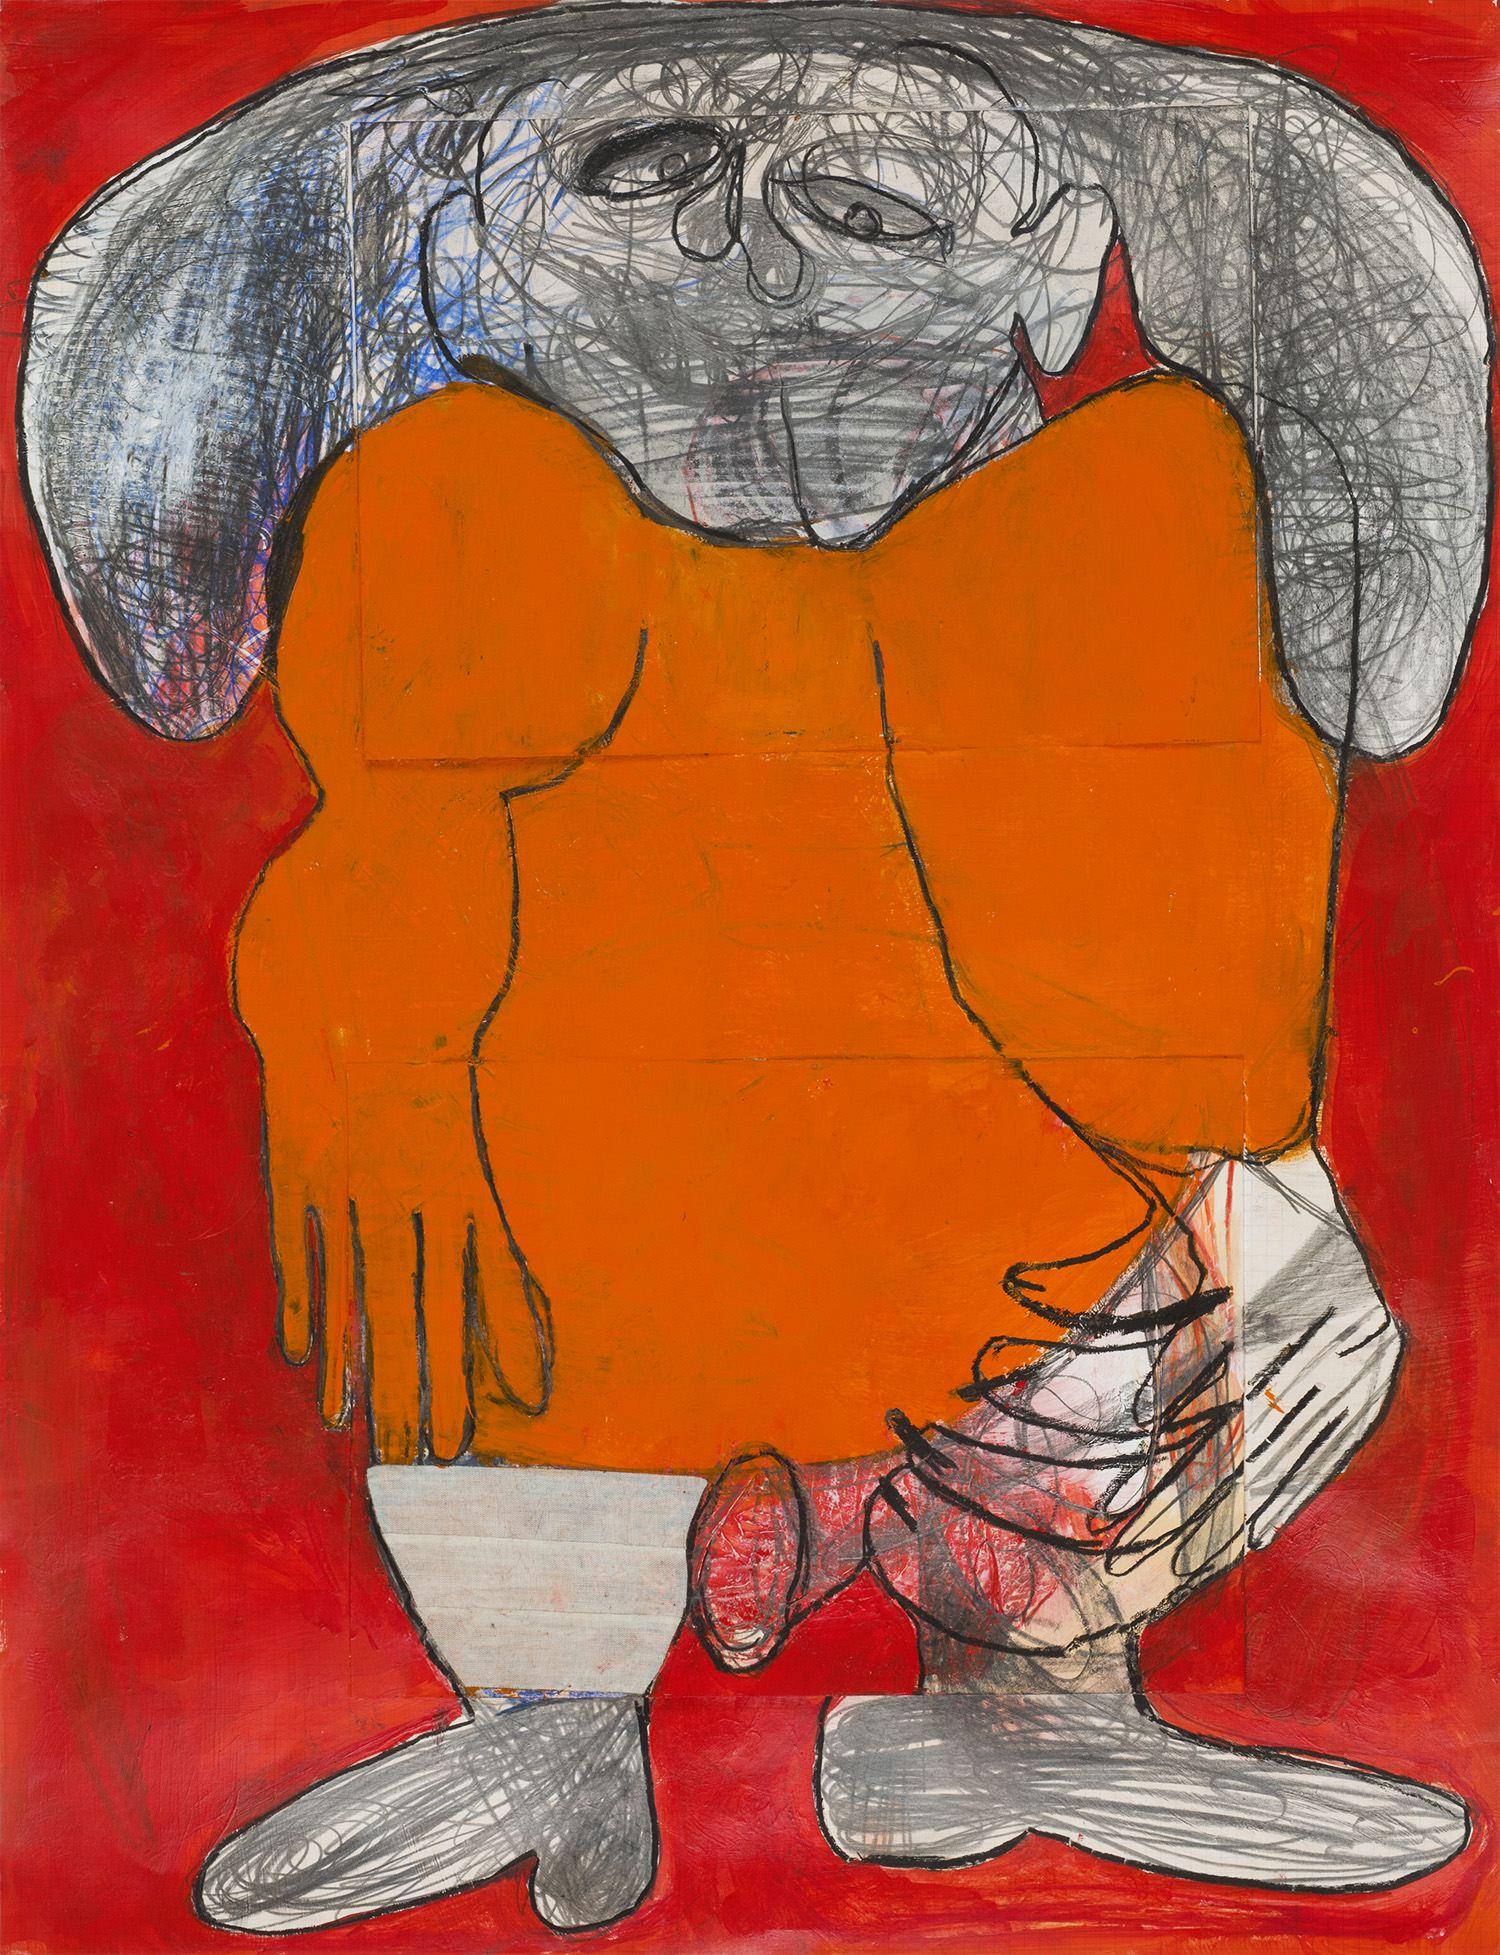 Caroline Demangel    Untitled  , 2014 Mixed media on paper 25 x 19 inches 63.5 x 48.3 cm CDm 10